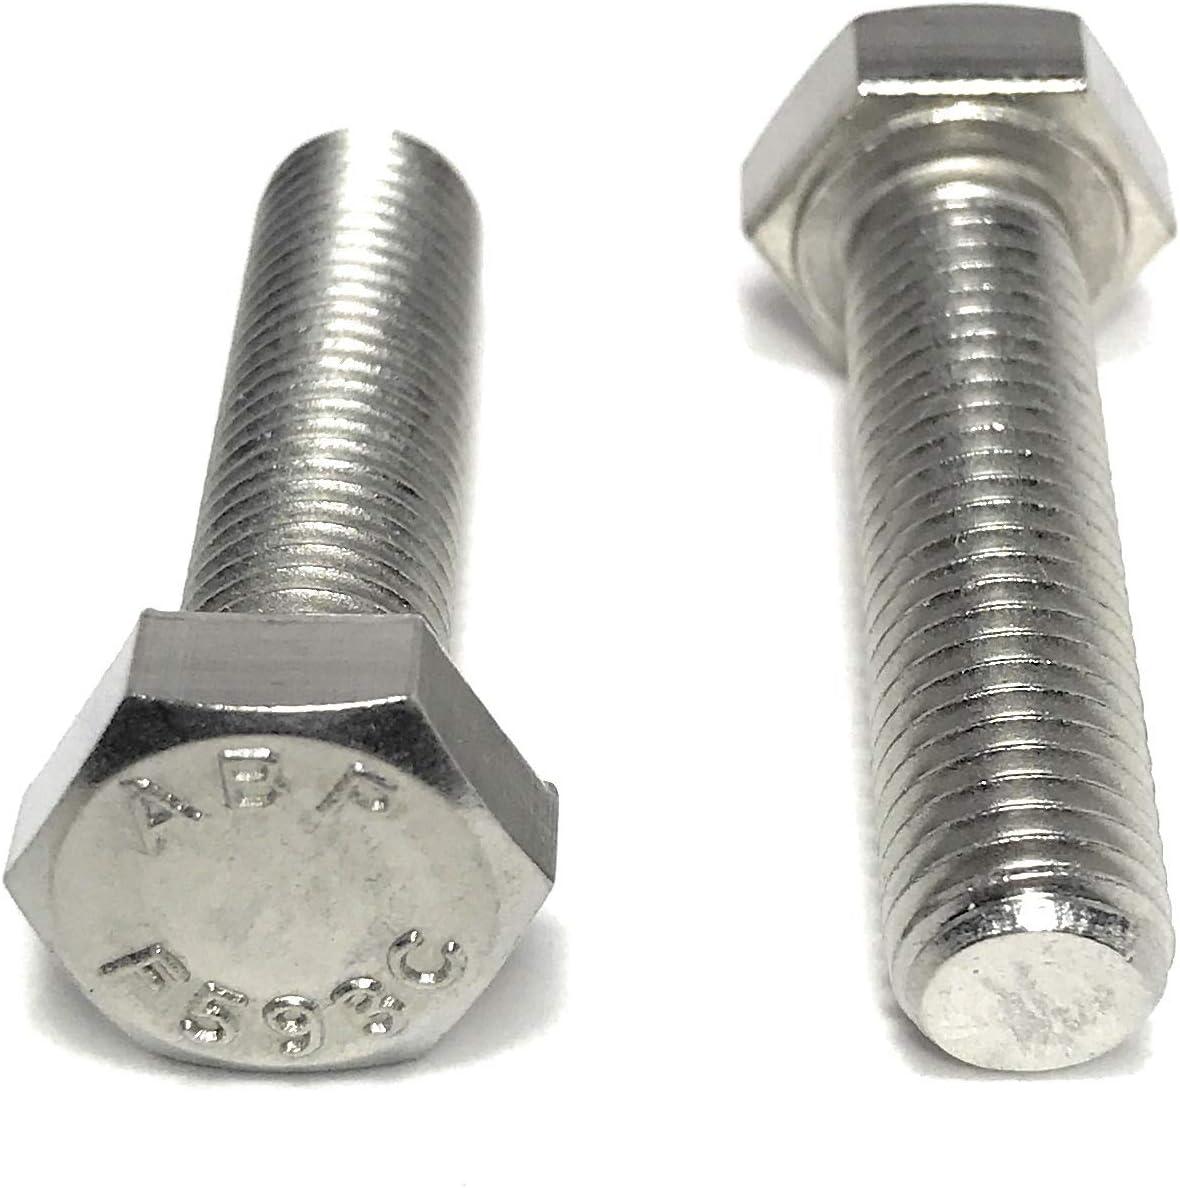 5//16-24x1 Stainless Steel Socket Head Cap Screw Allen Drive FINE THREAD 15